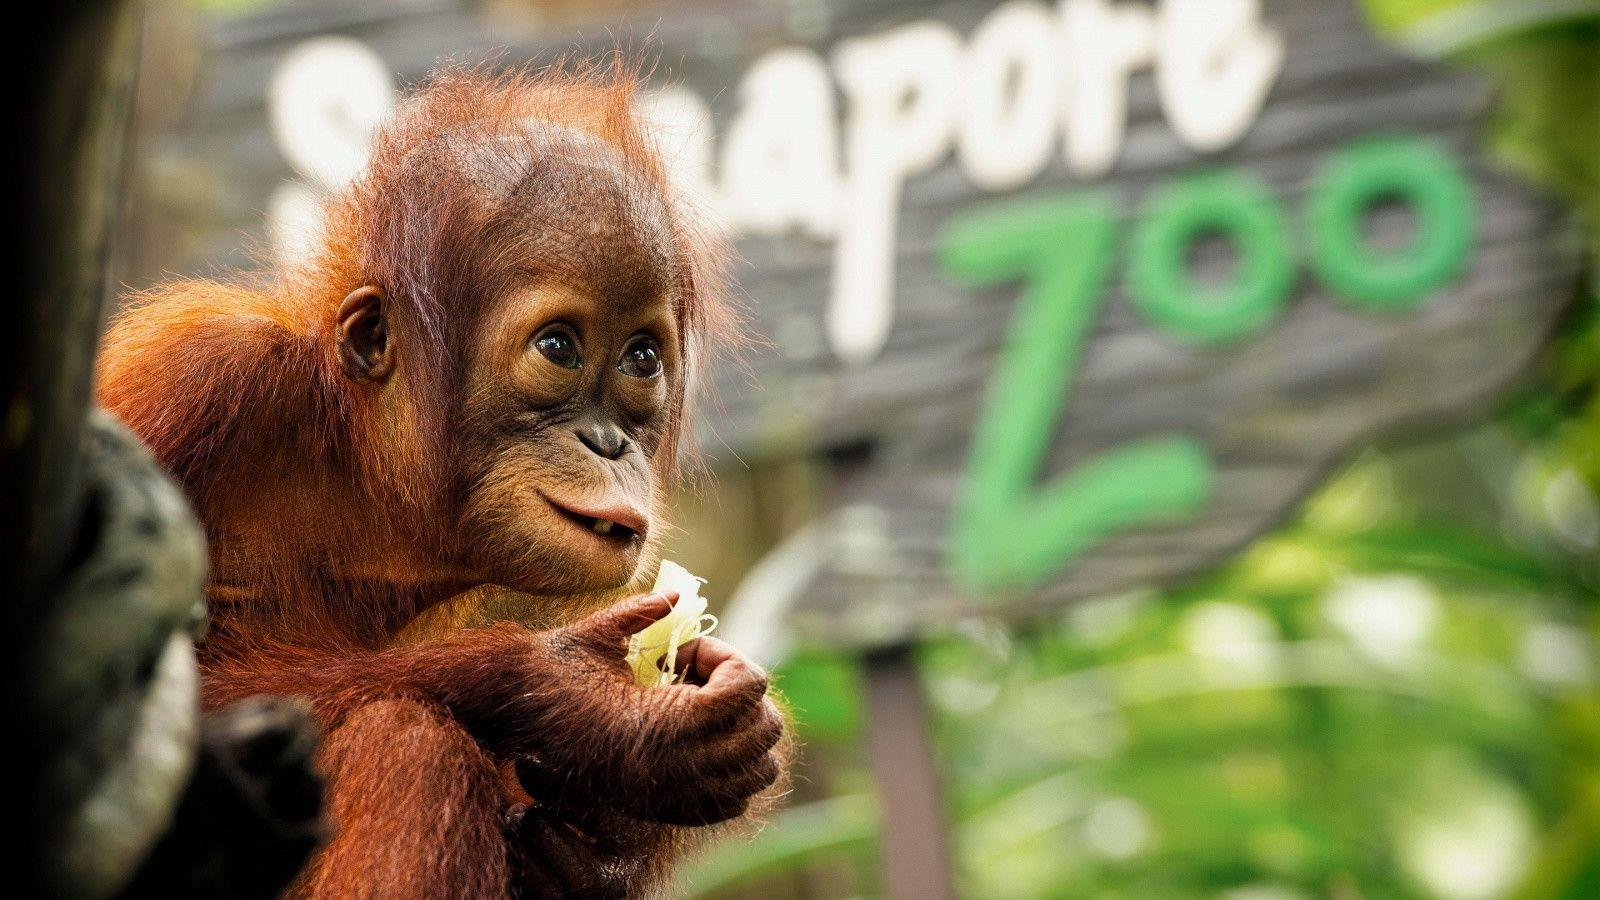 Cute Monkey Wallpaper Desktop Orangutan Wallpapers Wallpaper Cave